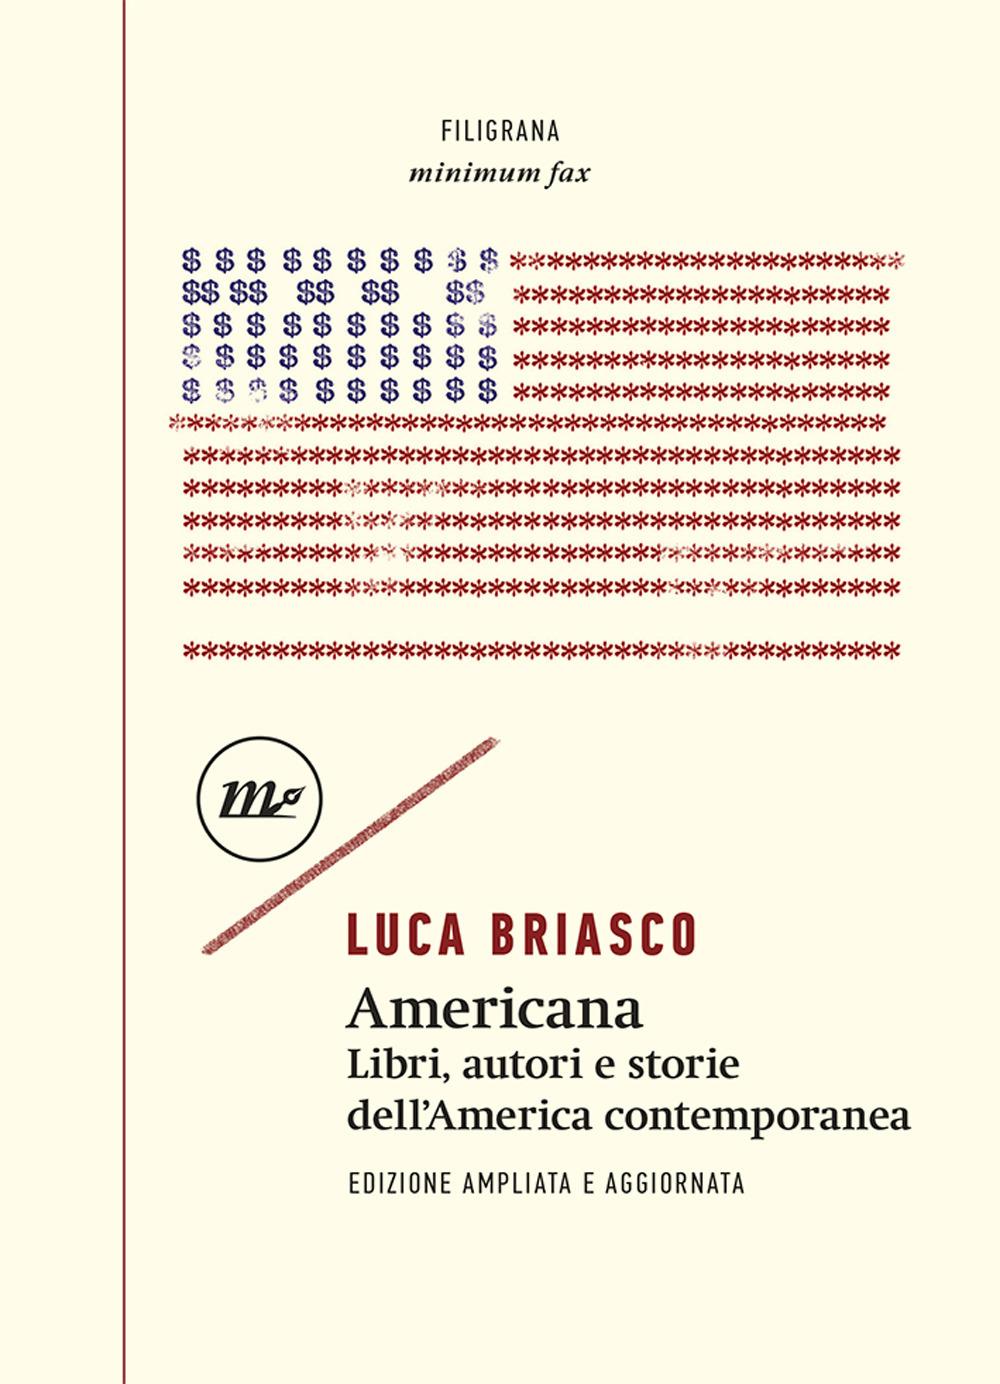 AMERICANA. 2A ED. - Briasco Luca - 9788833891880